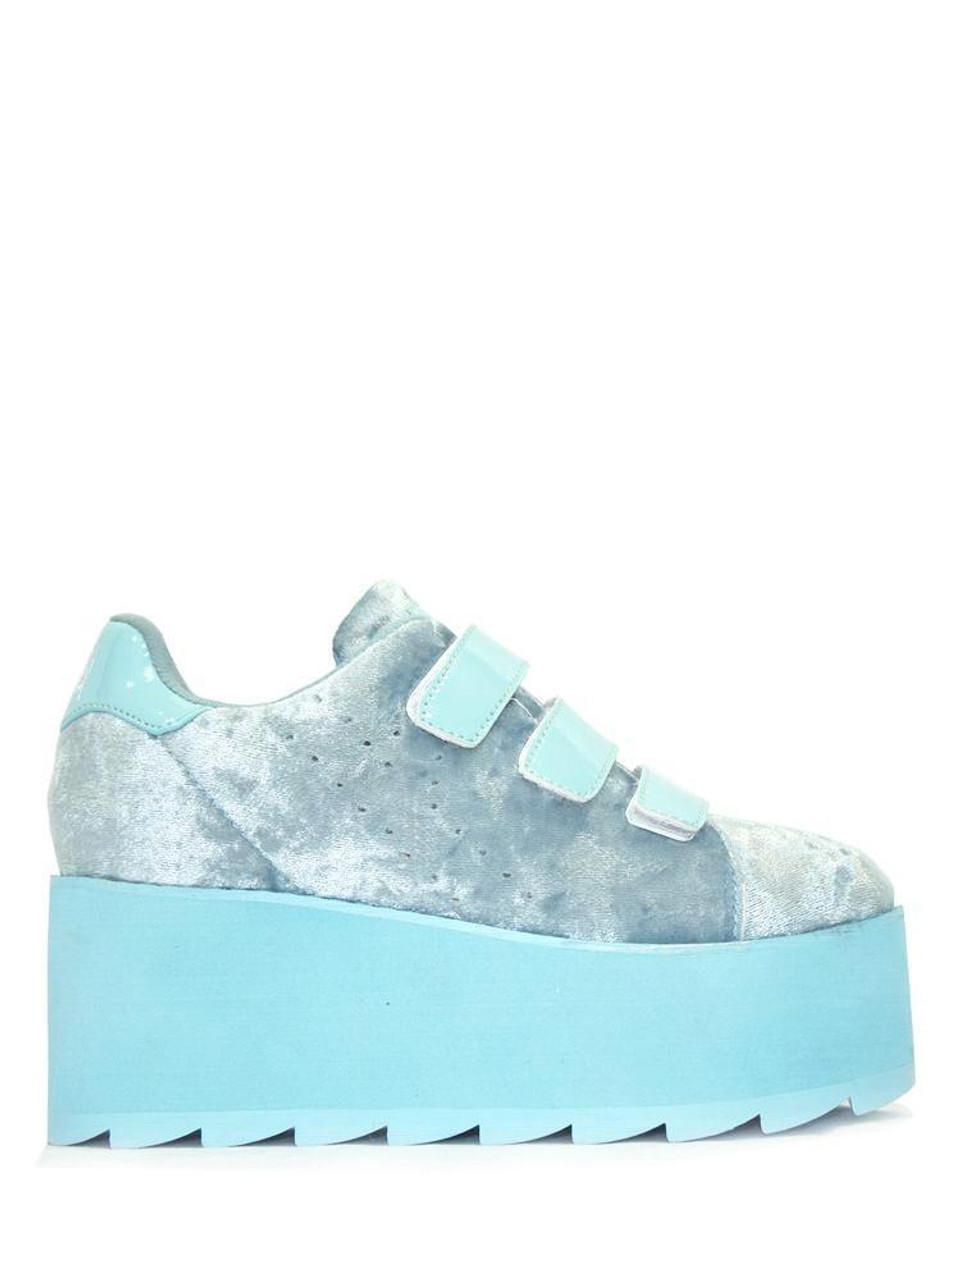 e0545b043f2 YRU Youth Rise Up Lala Velcro Velvet Blue Womens Platform Shoes Sneaker Punk